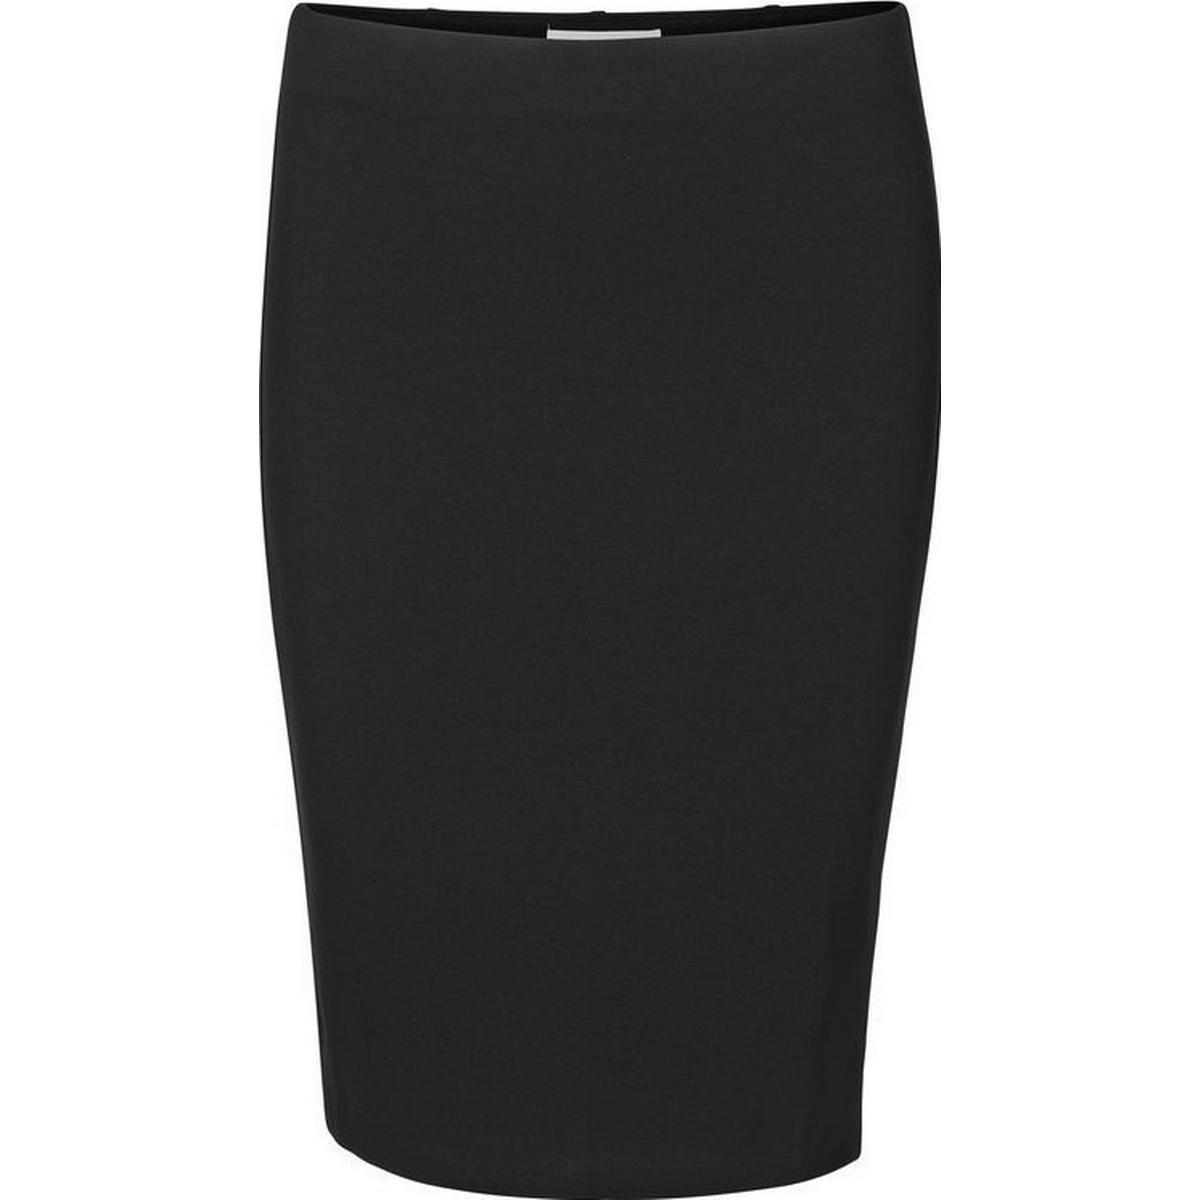 Minus Blazer Dametøj (100+ produkter) hos PriceRunner • Se